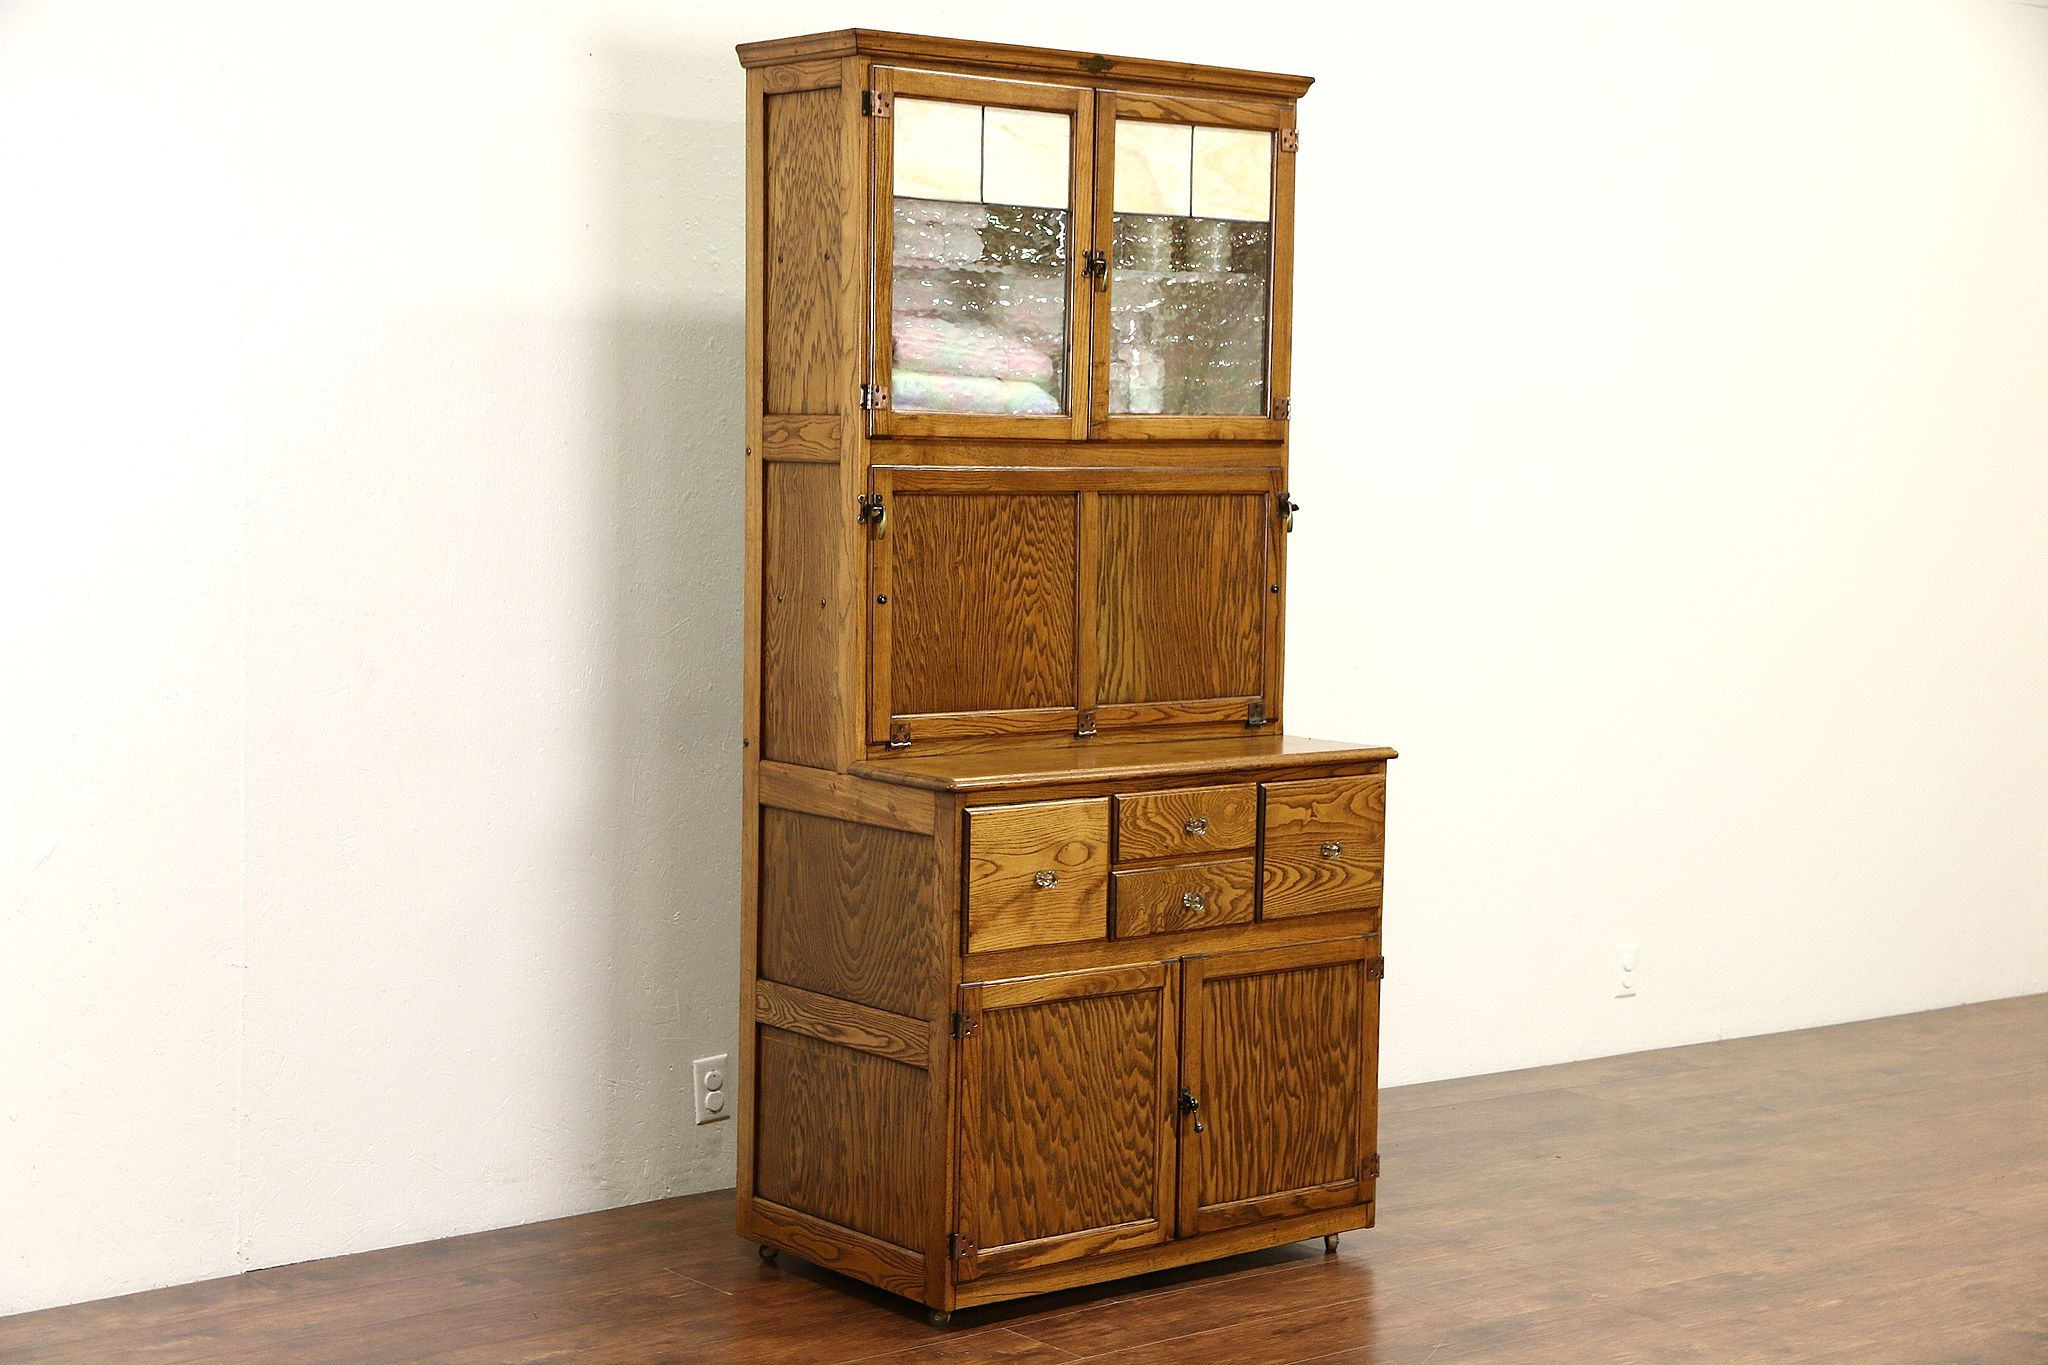 SOLD - Hygena English 1930's Oak Vintage Hoosier Kitchen Cupboard or Physician Cabinet - Harp Gallery